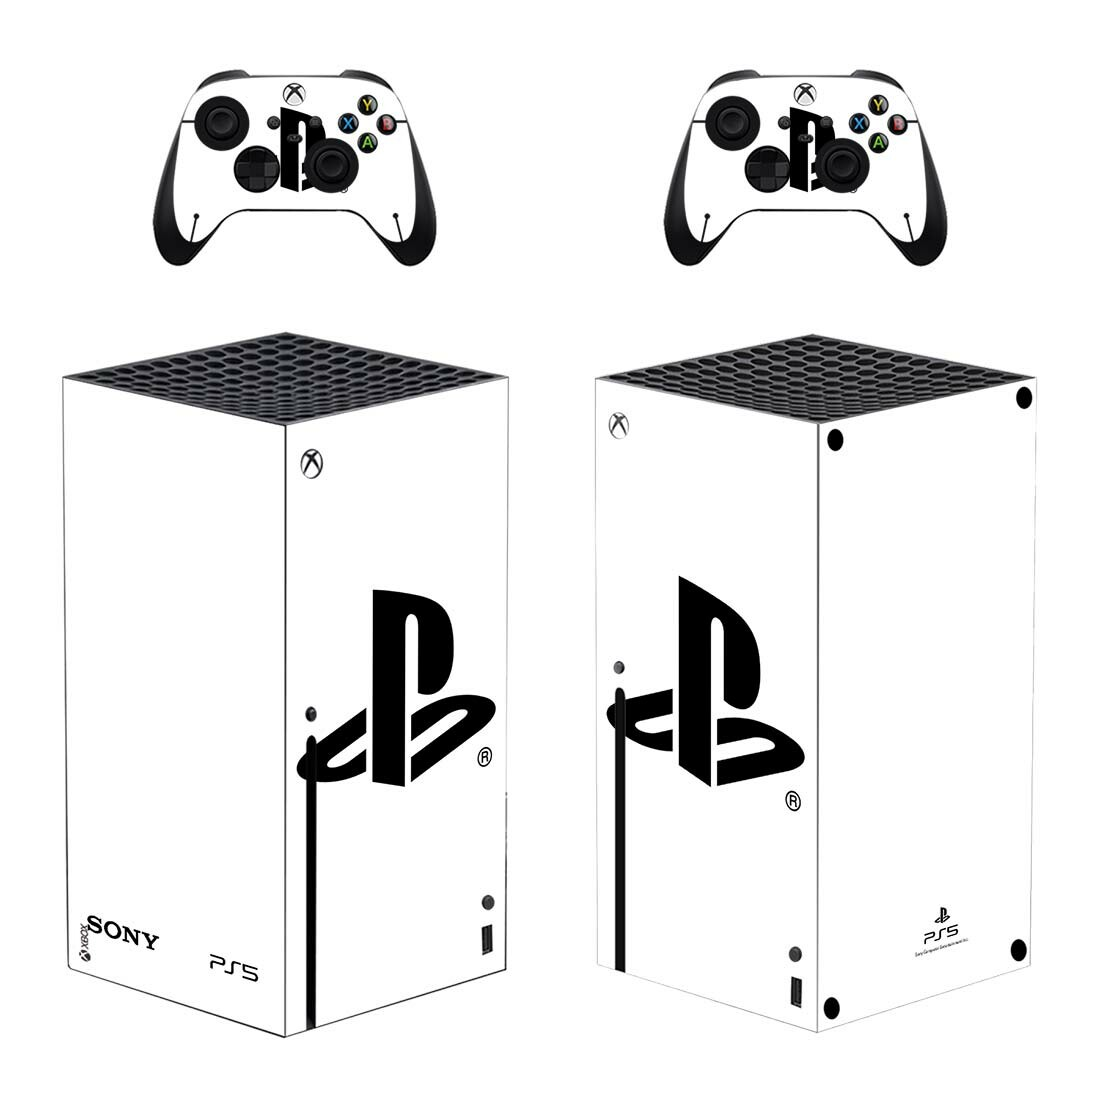 White Color Standard Disc Xbox Series X Skin Sticker Decal Design 1